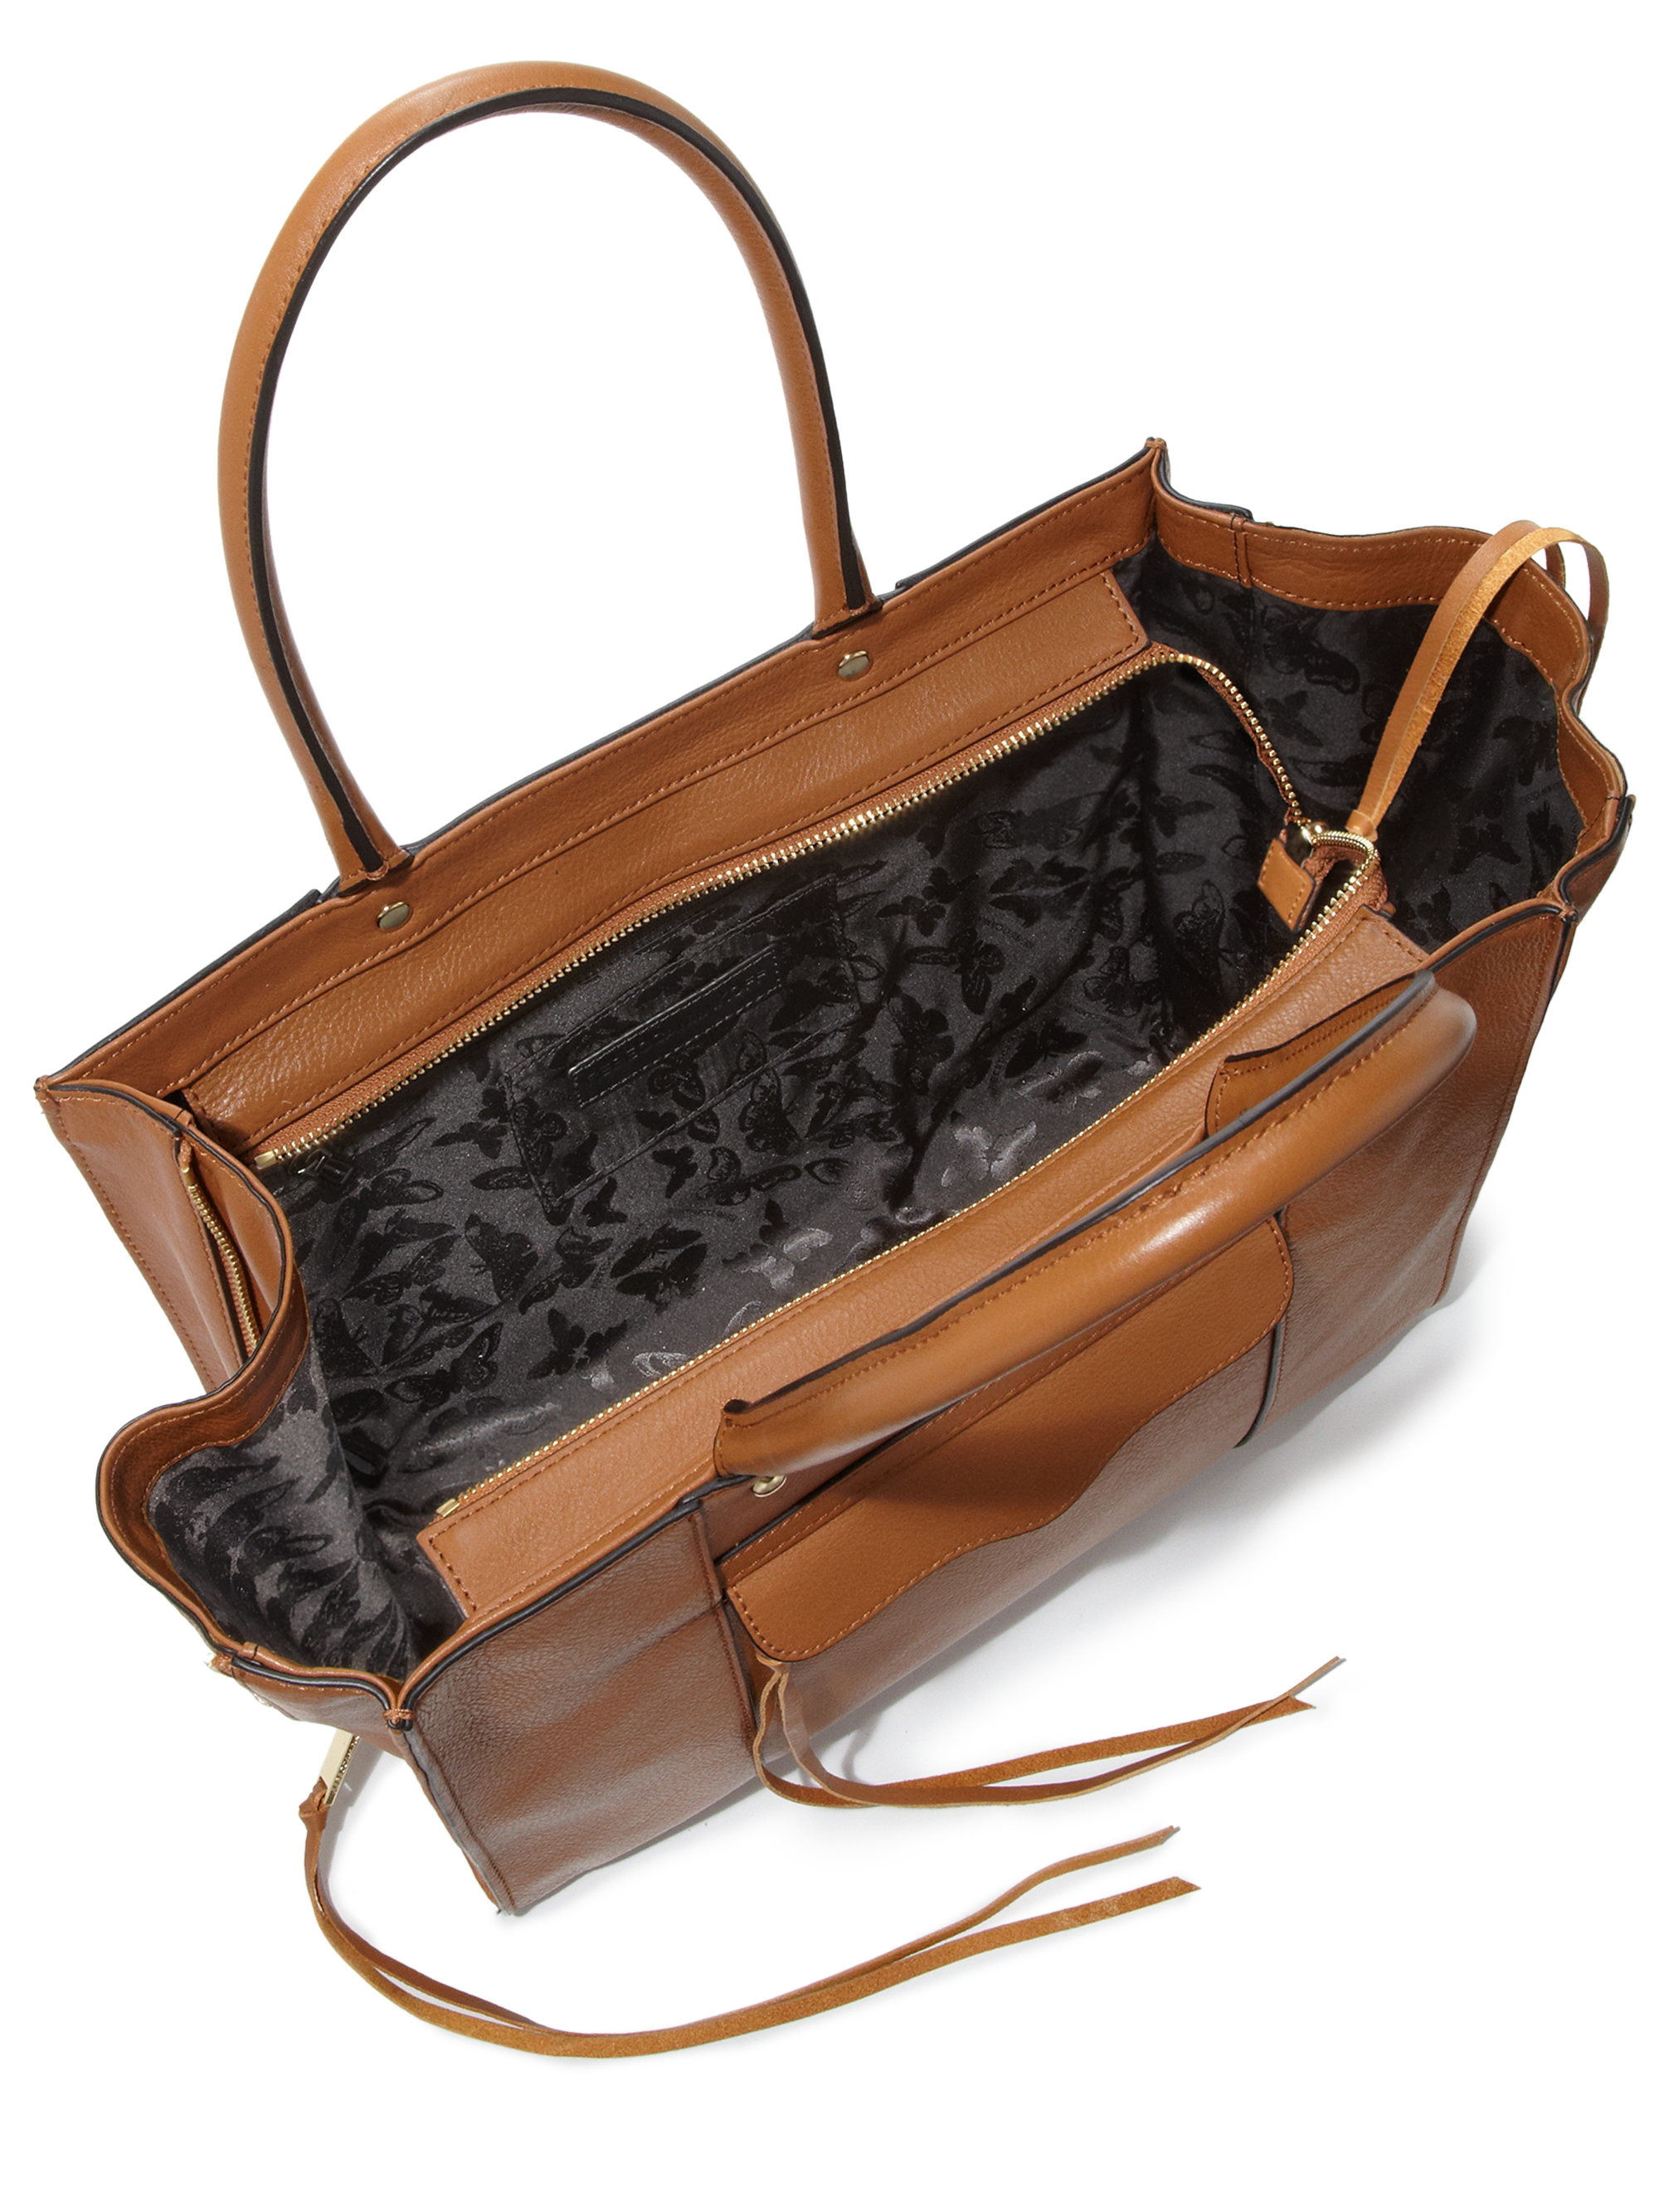 Rebecca Minkoff Mab Medium Side Zip Leather Tote In Brown